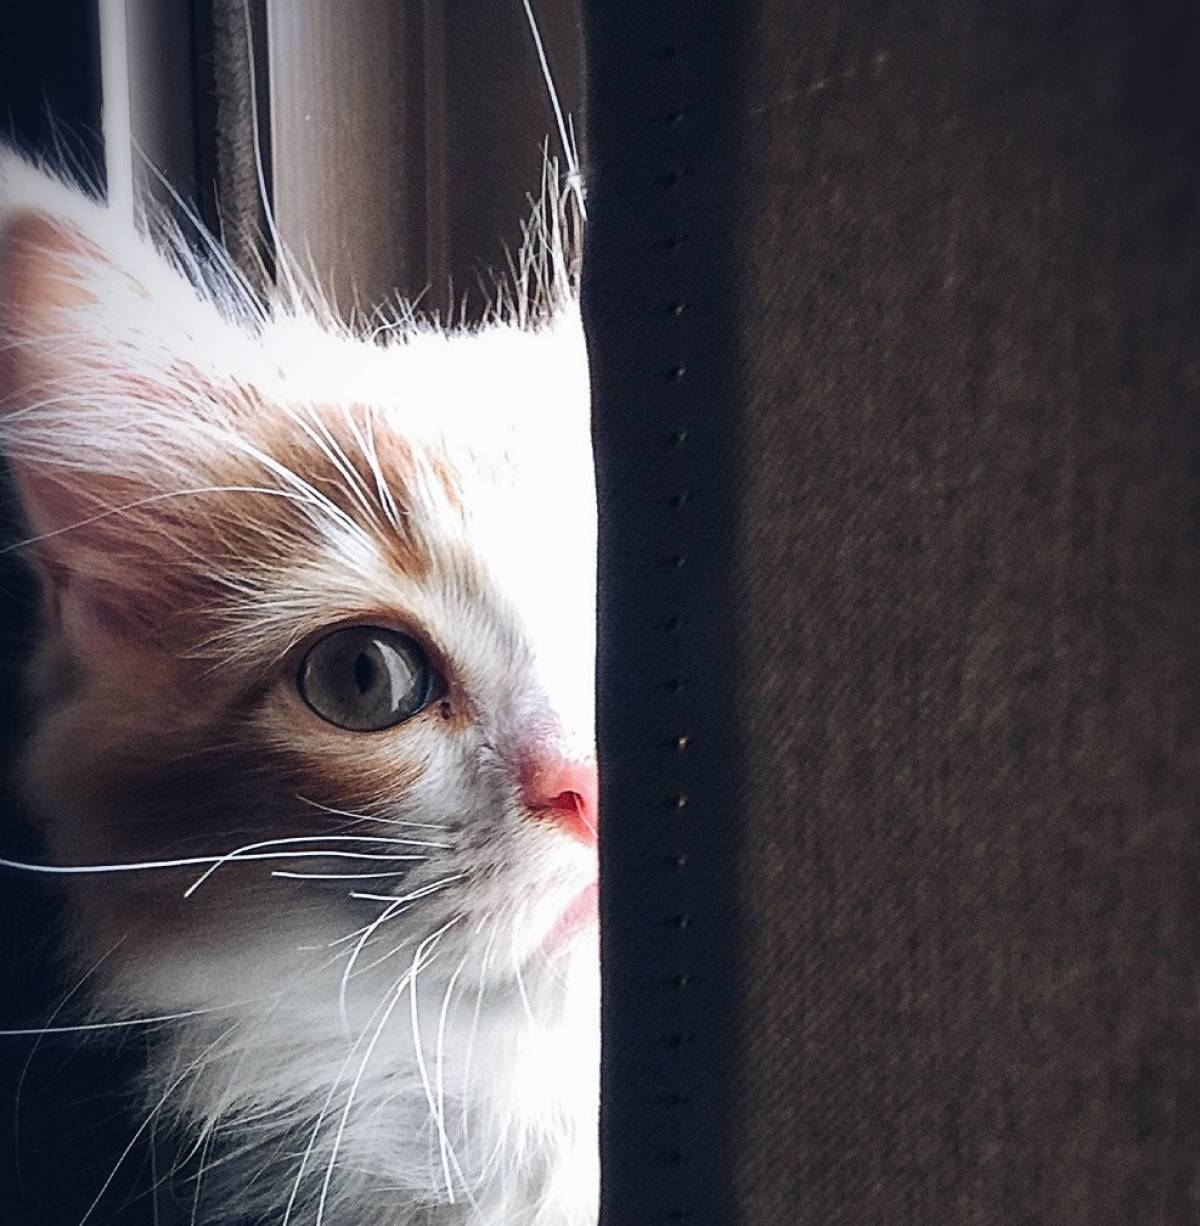 b7f12626d72d Οι γάτες μπορούν να αναγνωρίσουν το όνομά τους